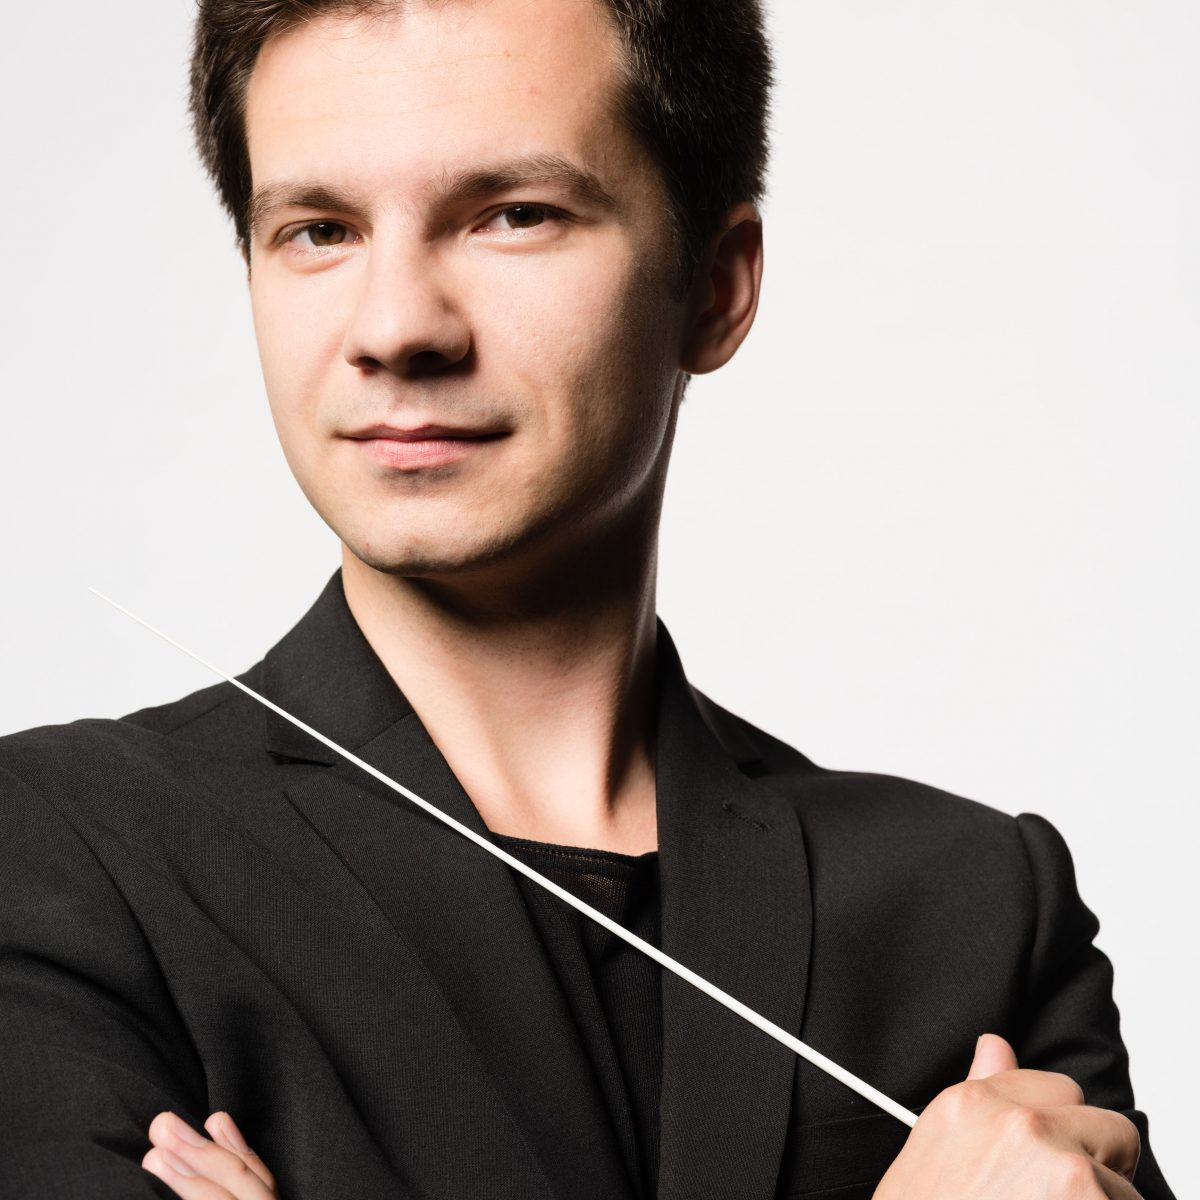 Alexey Mikhaylenko